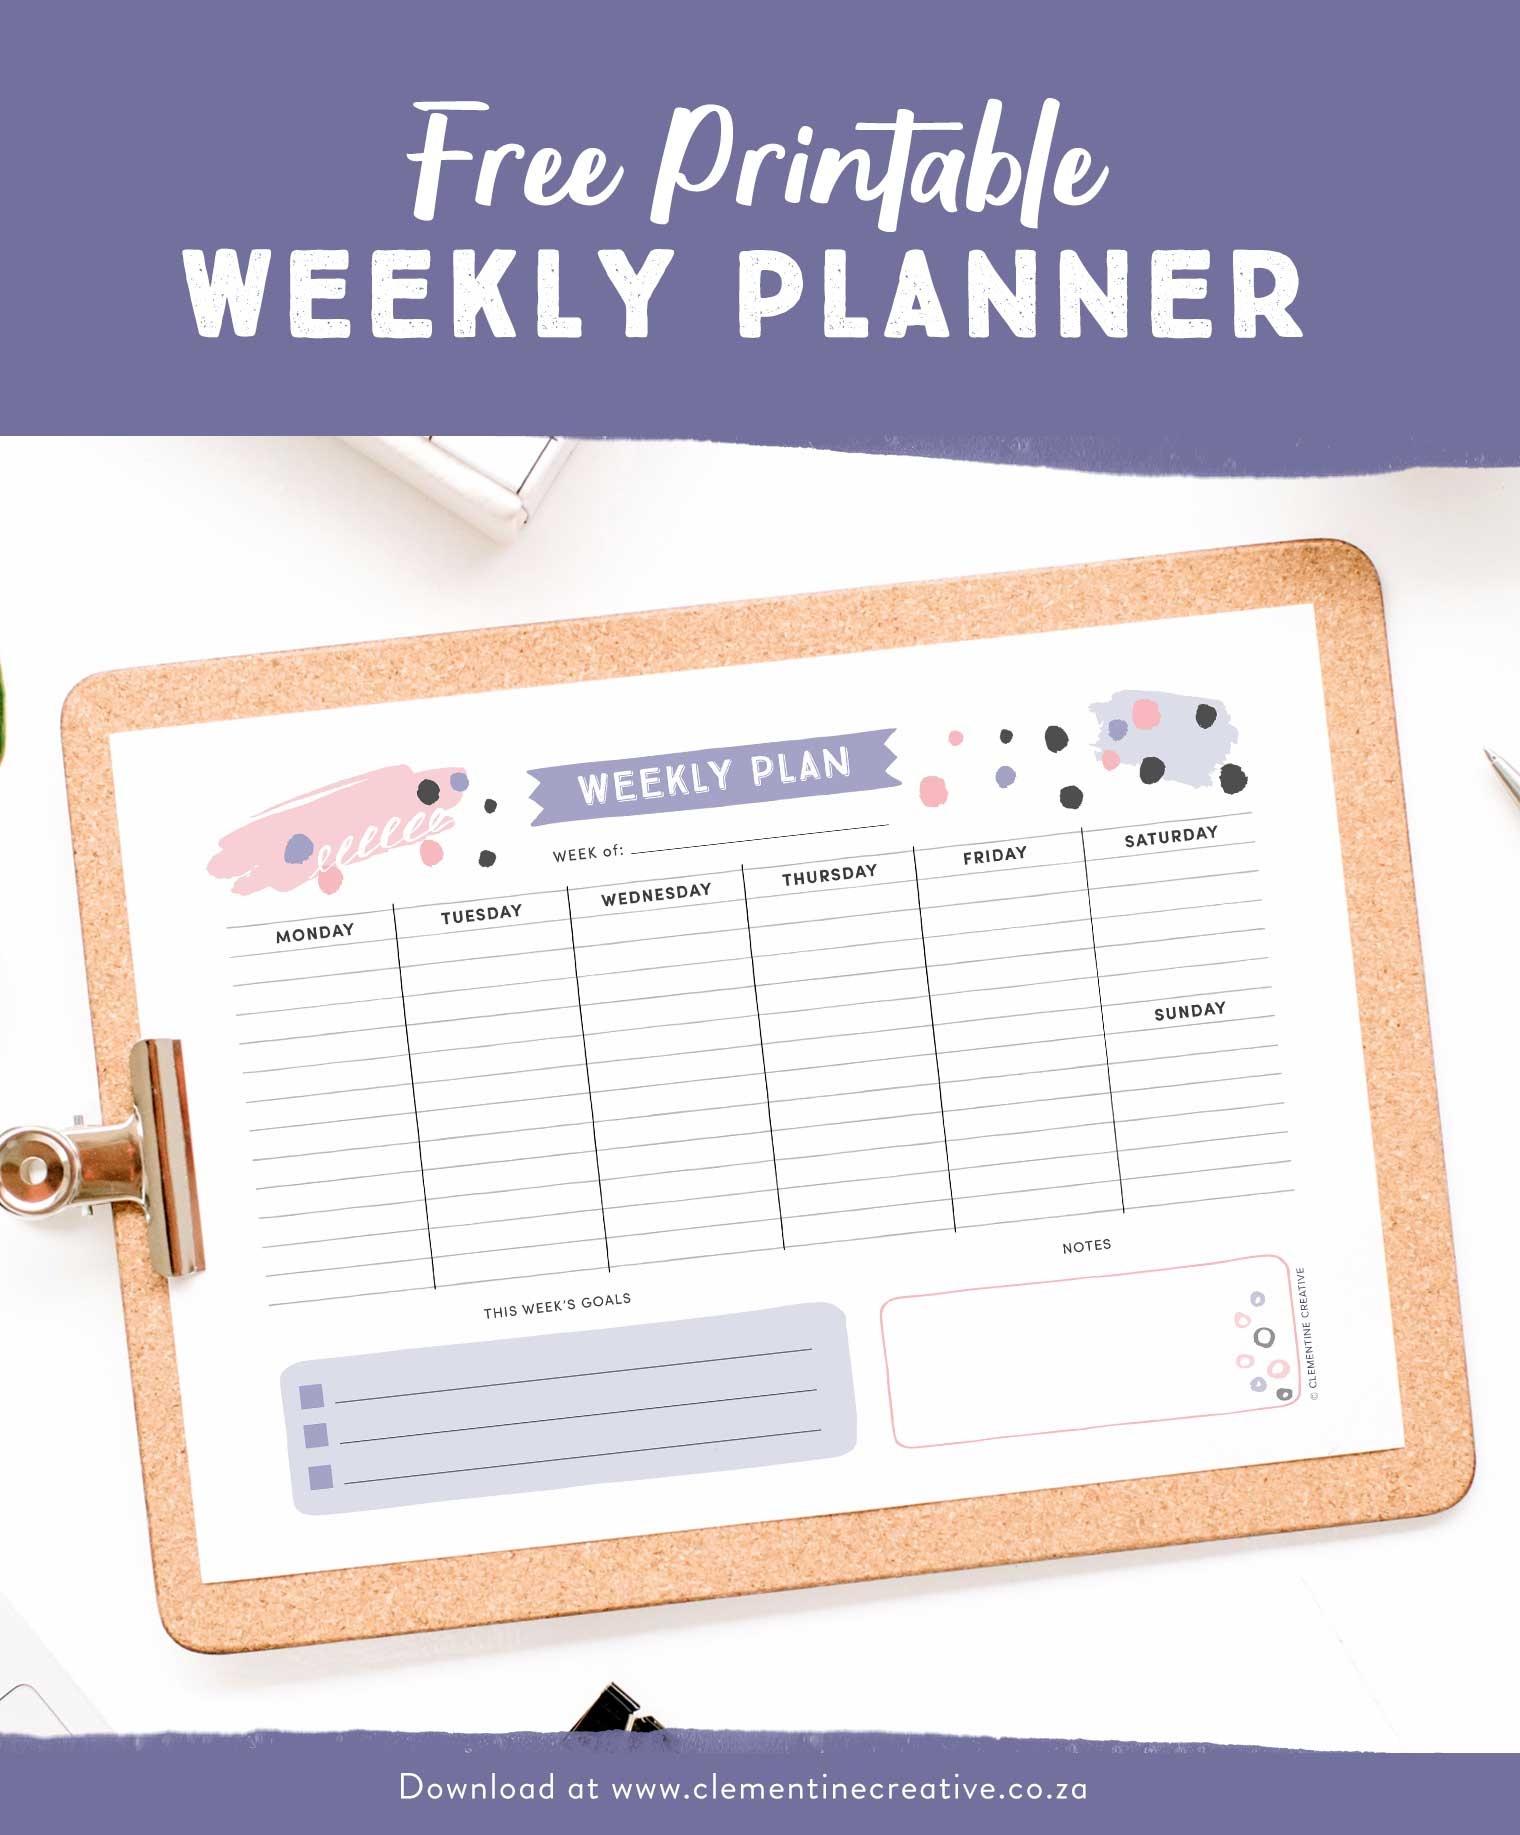 Get Organised With This Free Printable Weekly Planner - Cute - Free Printable Images